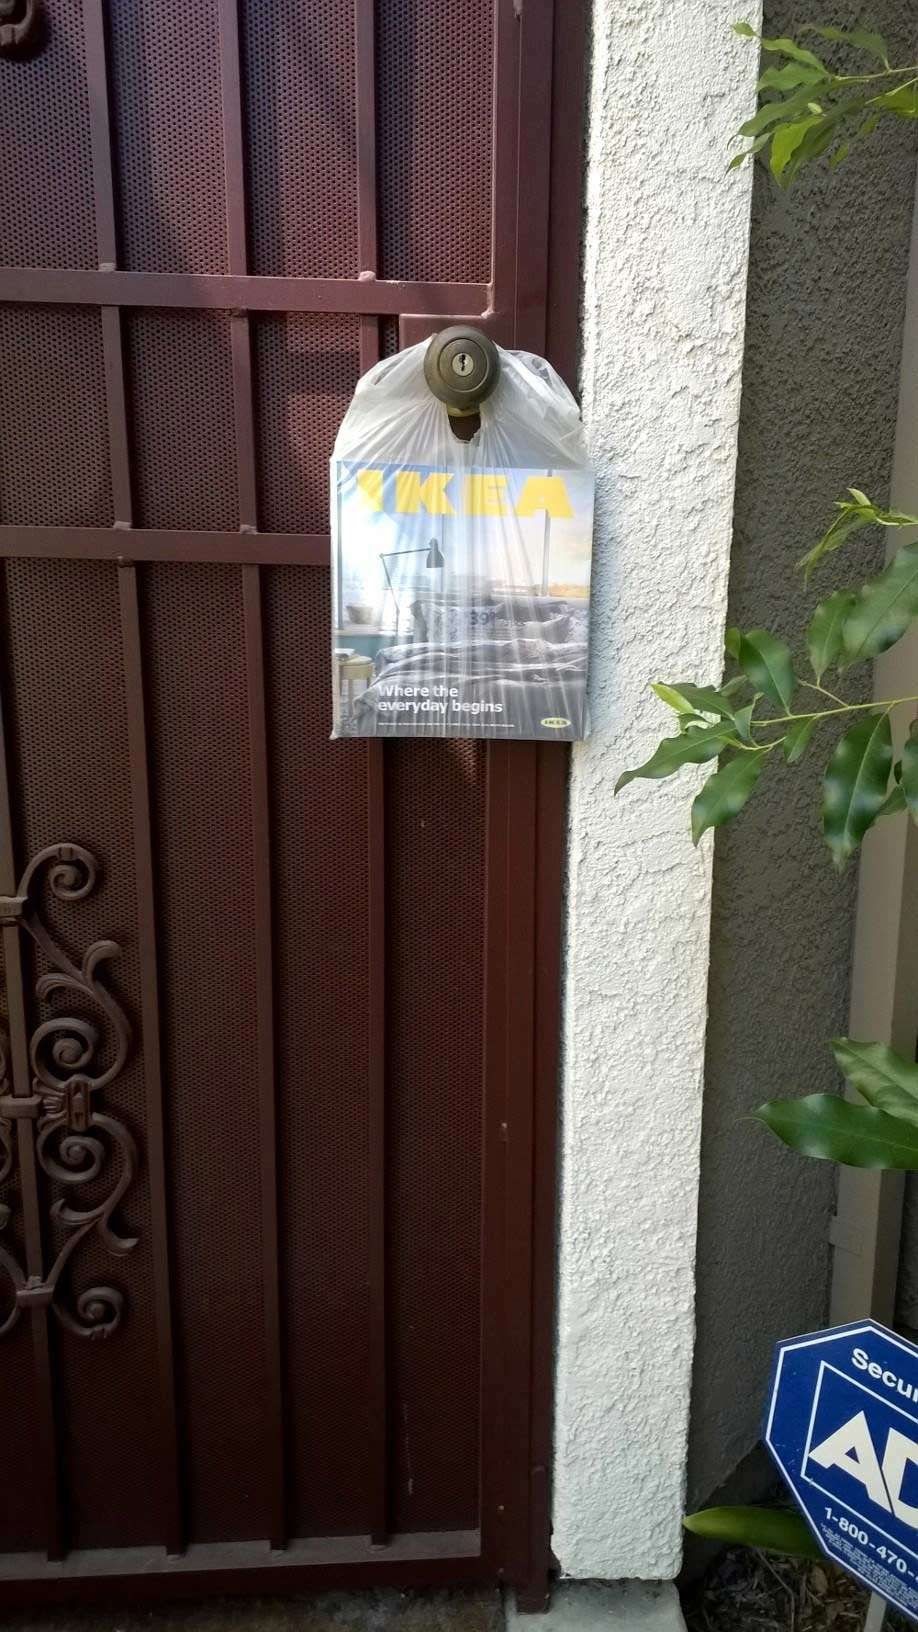 IKEA bag on a door